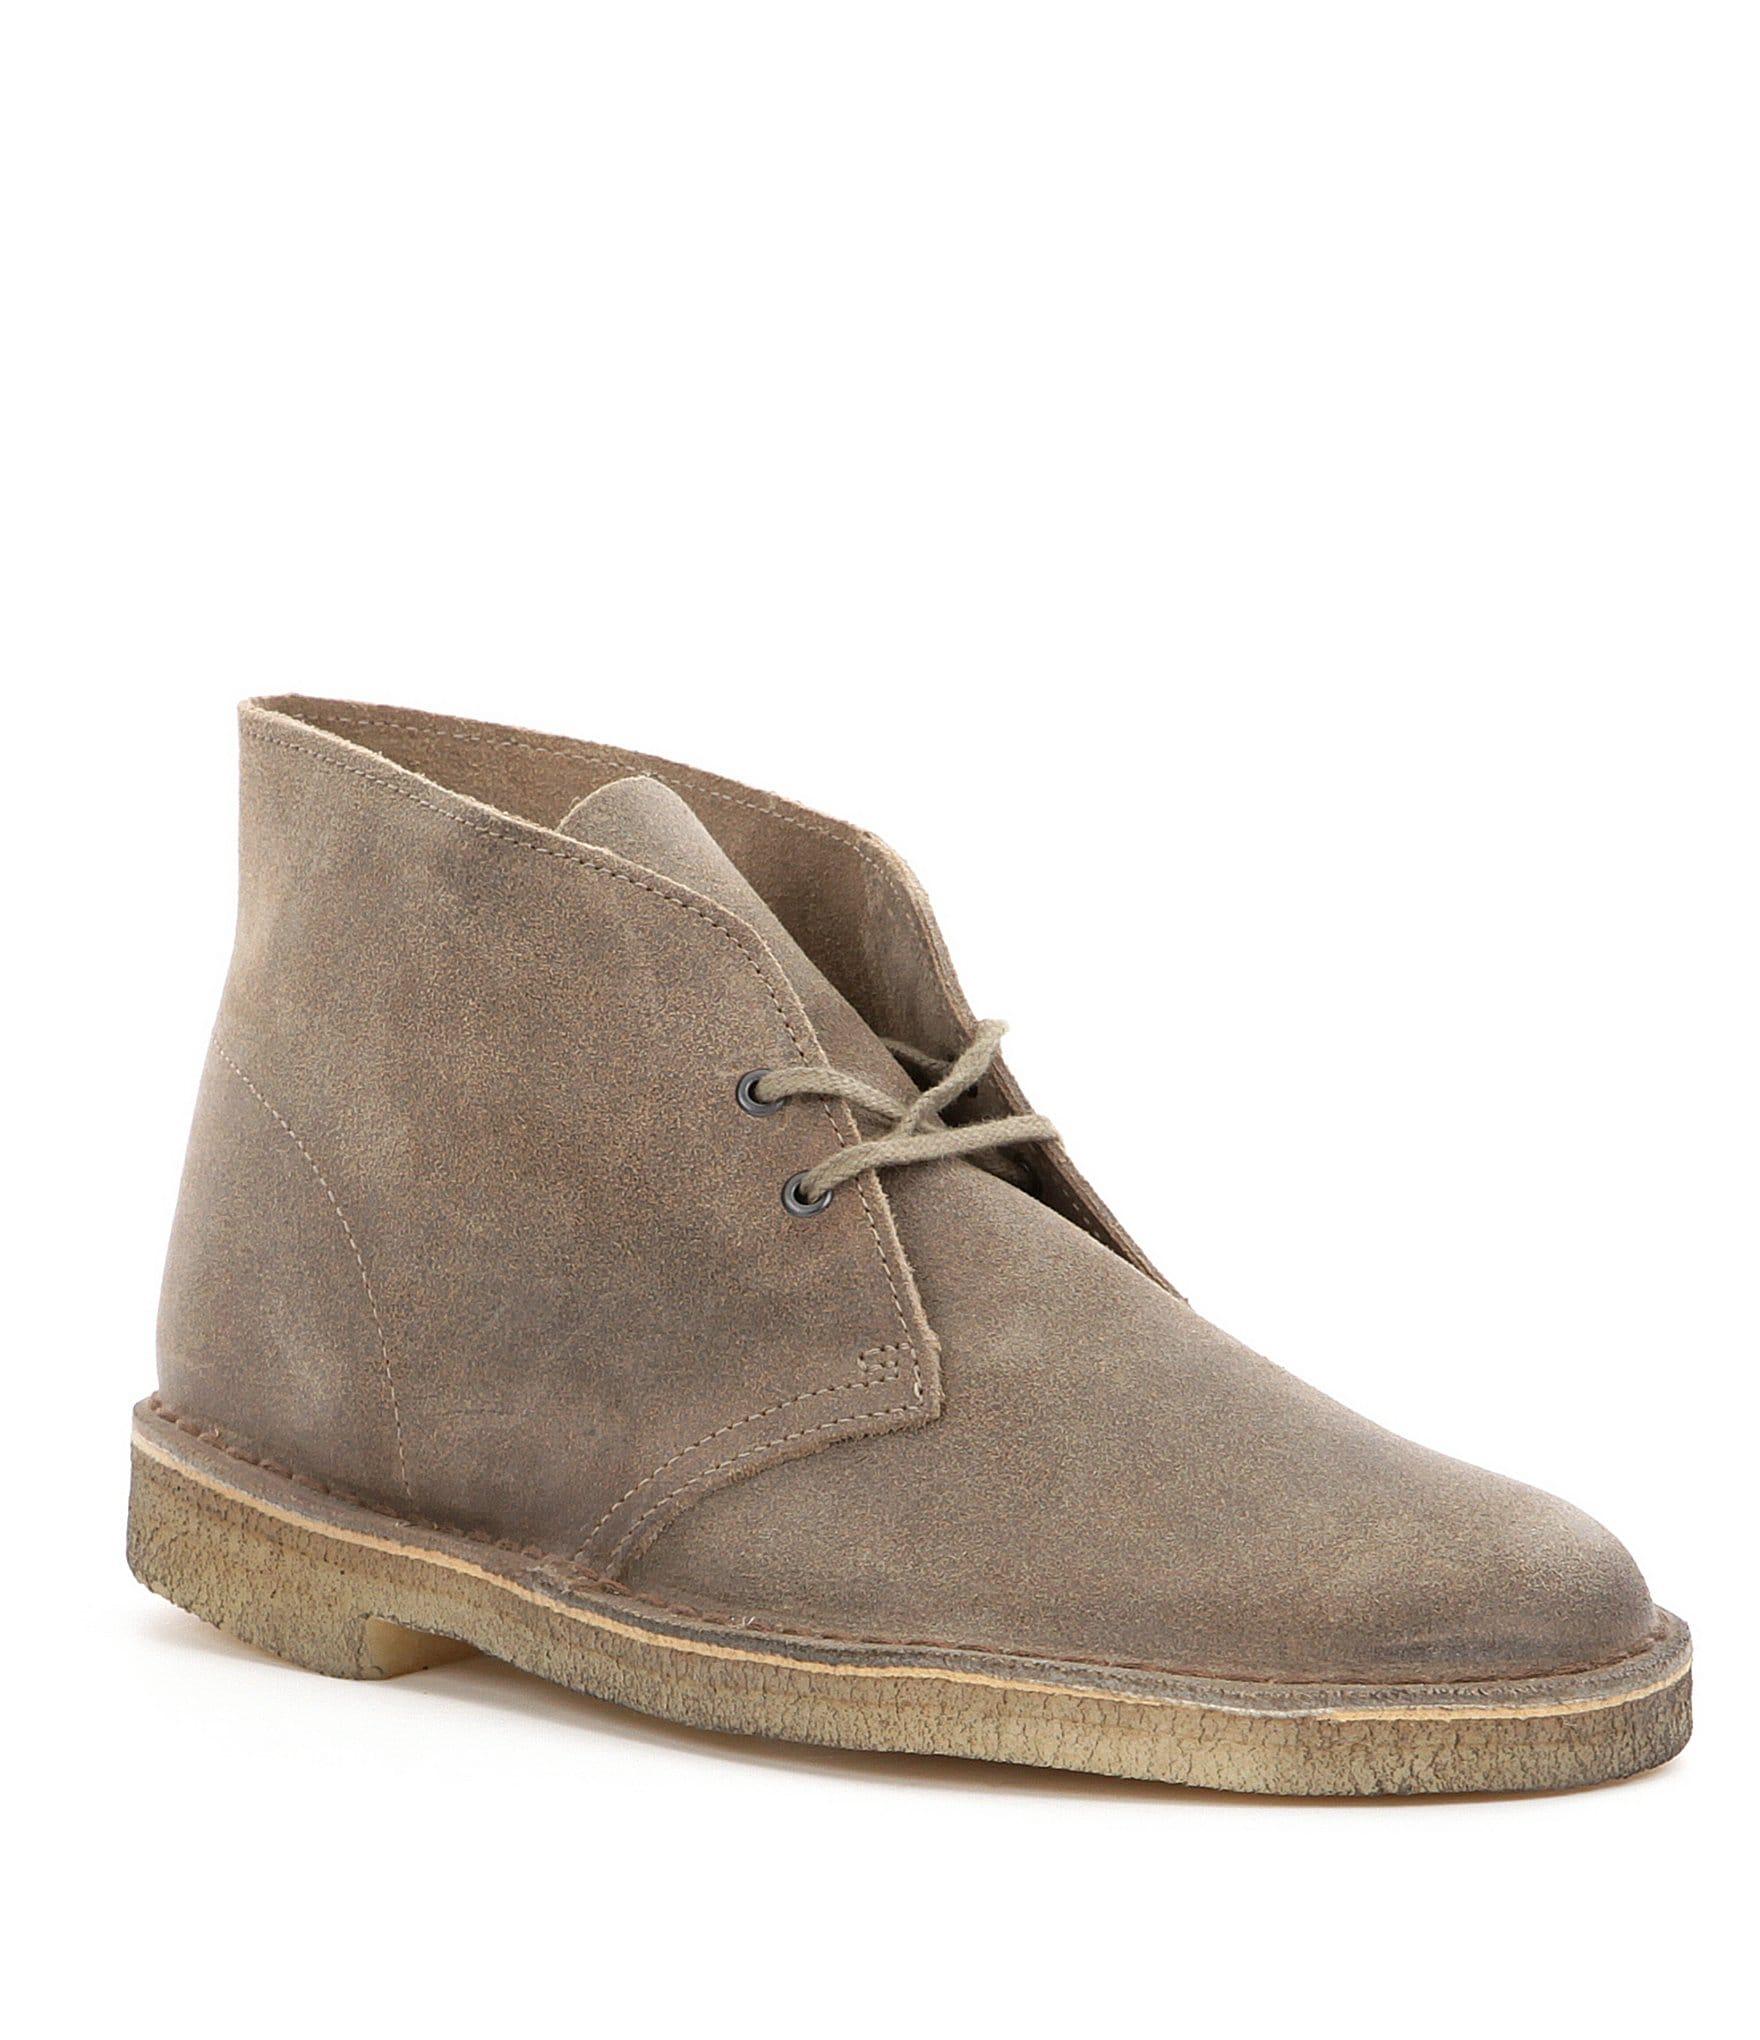 clarks originals men s desert boot dillards. Black Bedroom Furniture Sets. Home Design Ideas